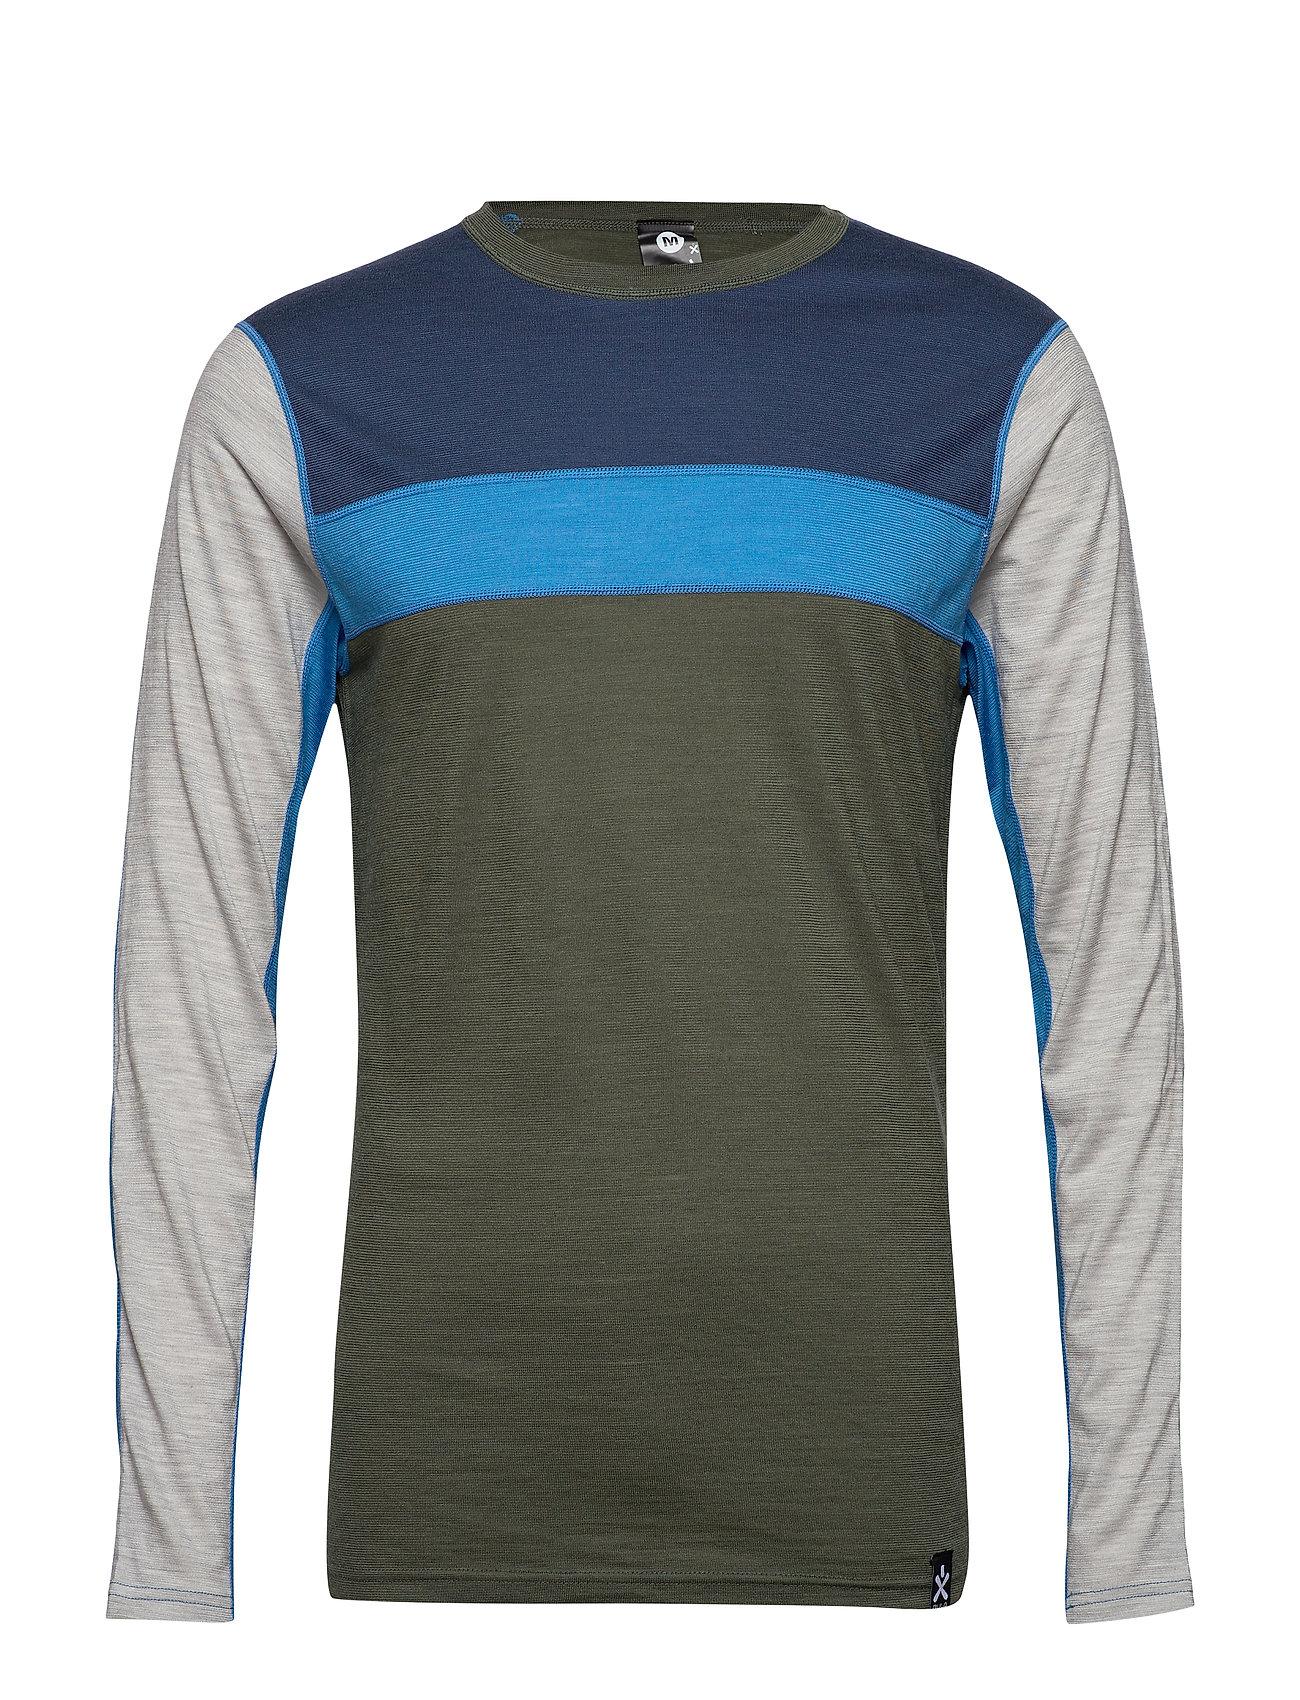 Image of Retro Wool Crew Base Layer Tops Blå Bula (3406243095)